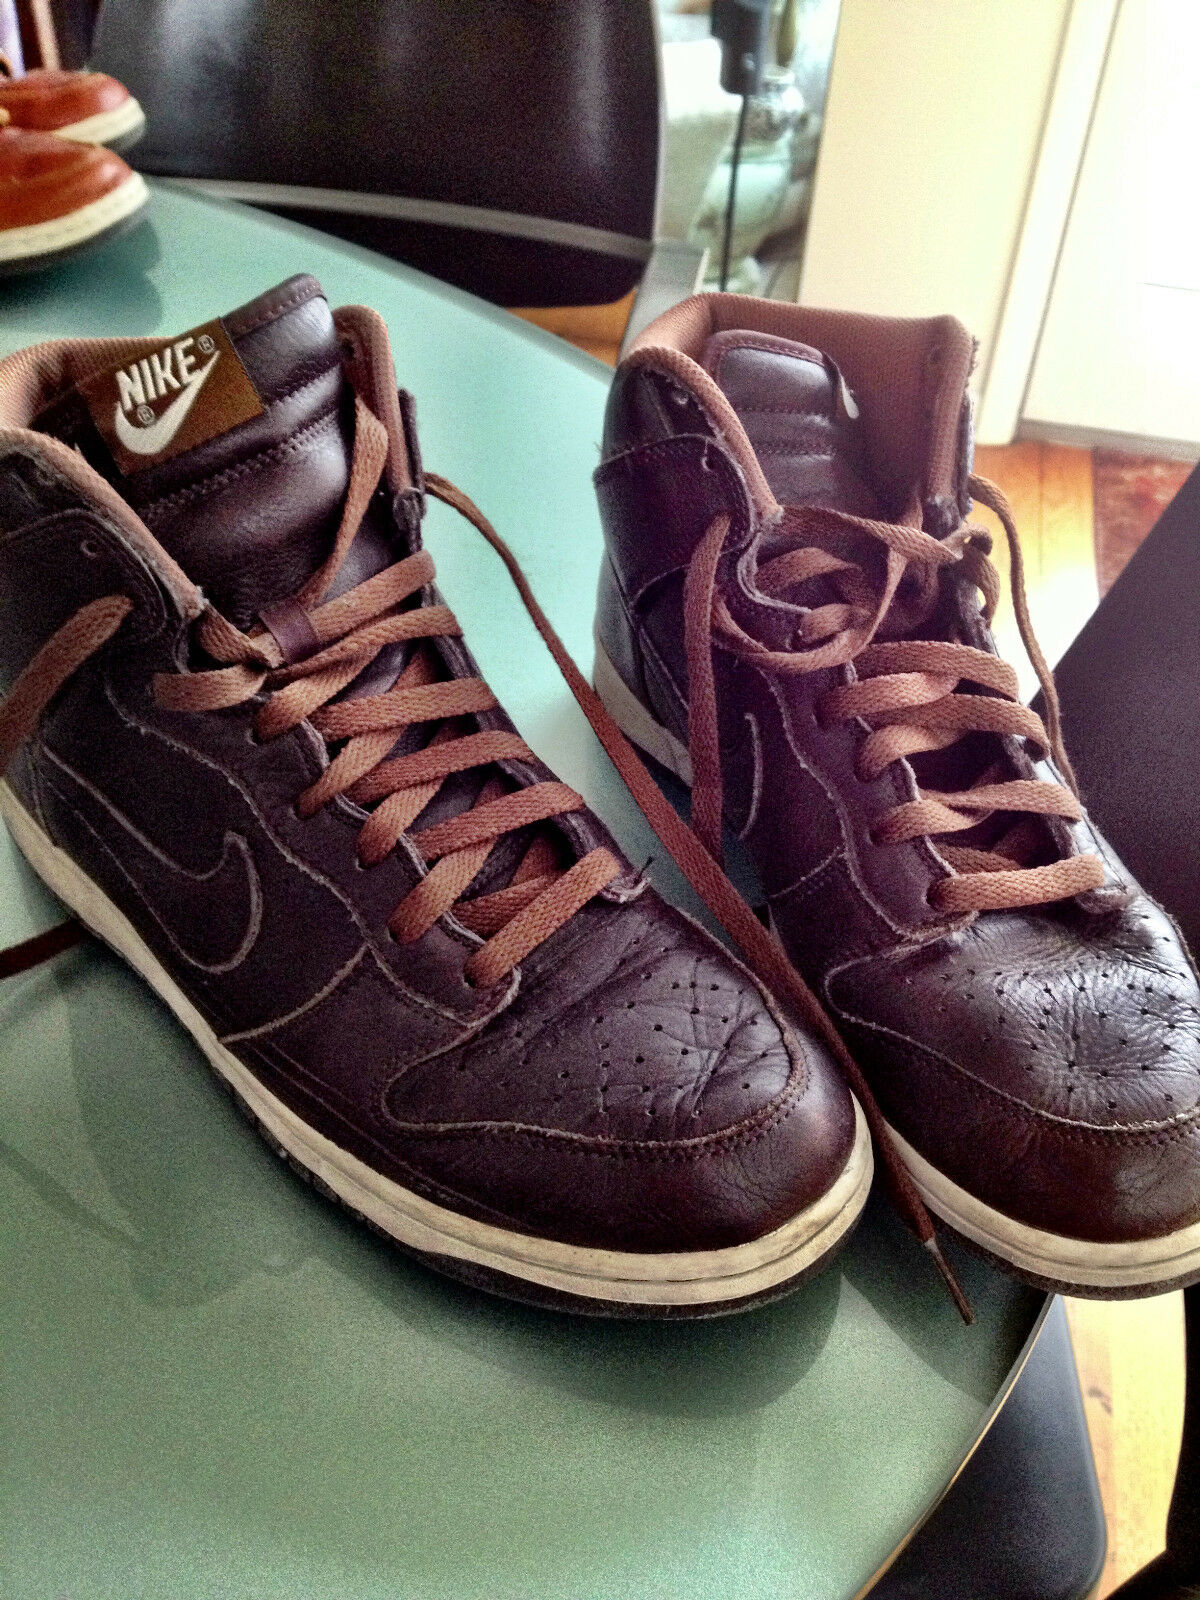 Nike Dunk Abedul High Premium Barroco marrón Abedul Dunk 1ae27b